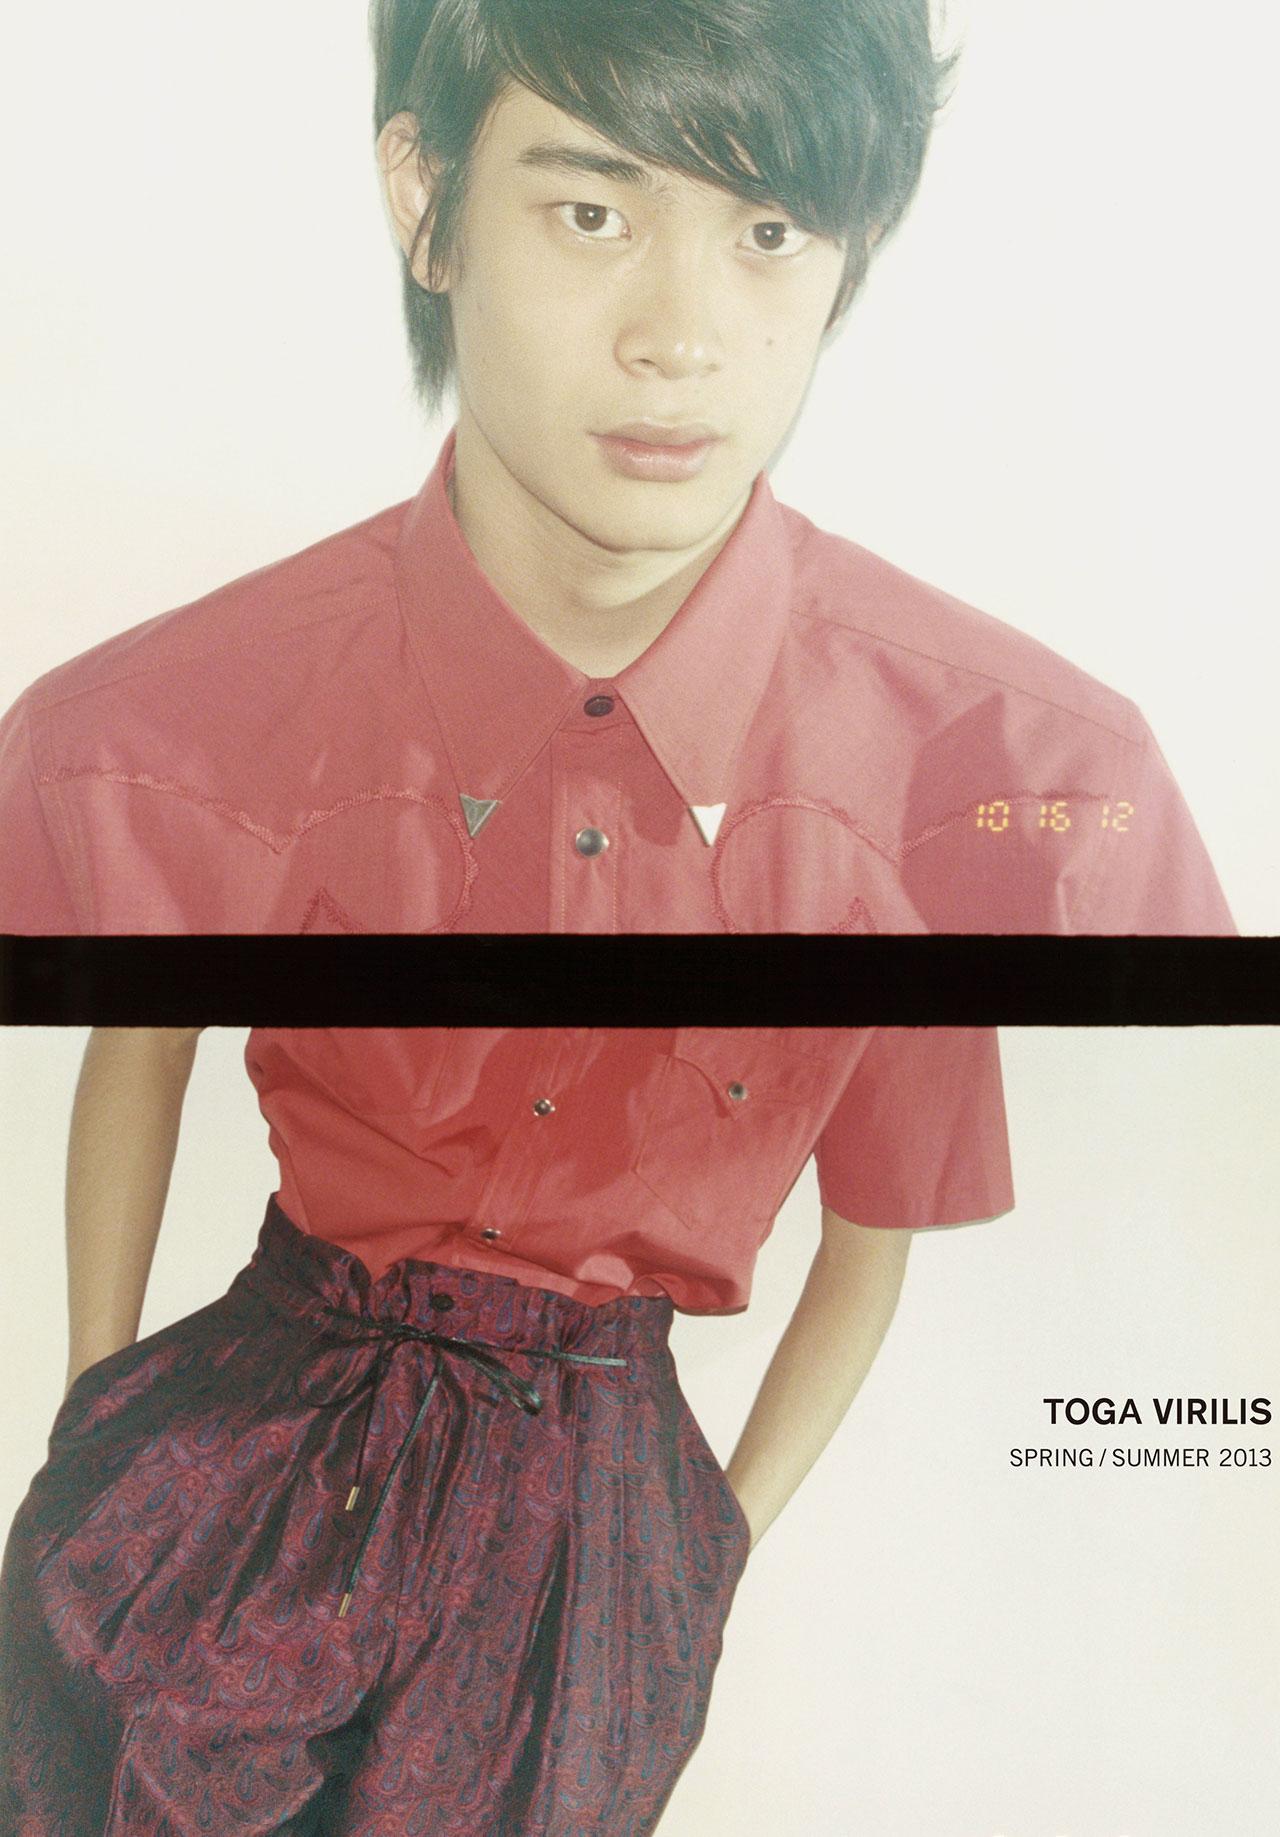 TOGA VIRILIS 2013 S/S Campagin